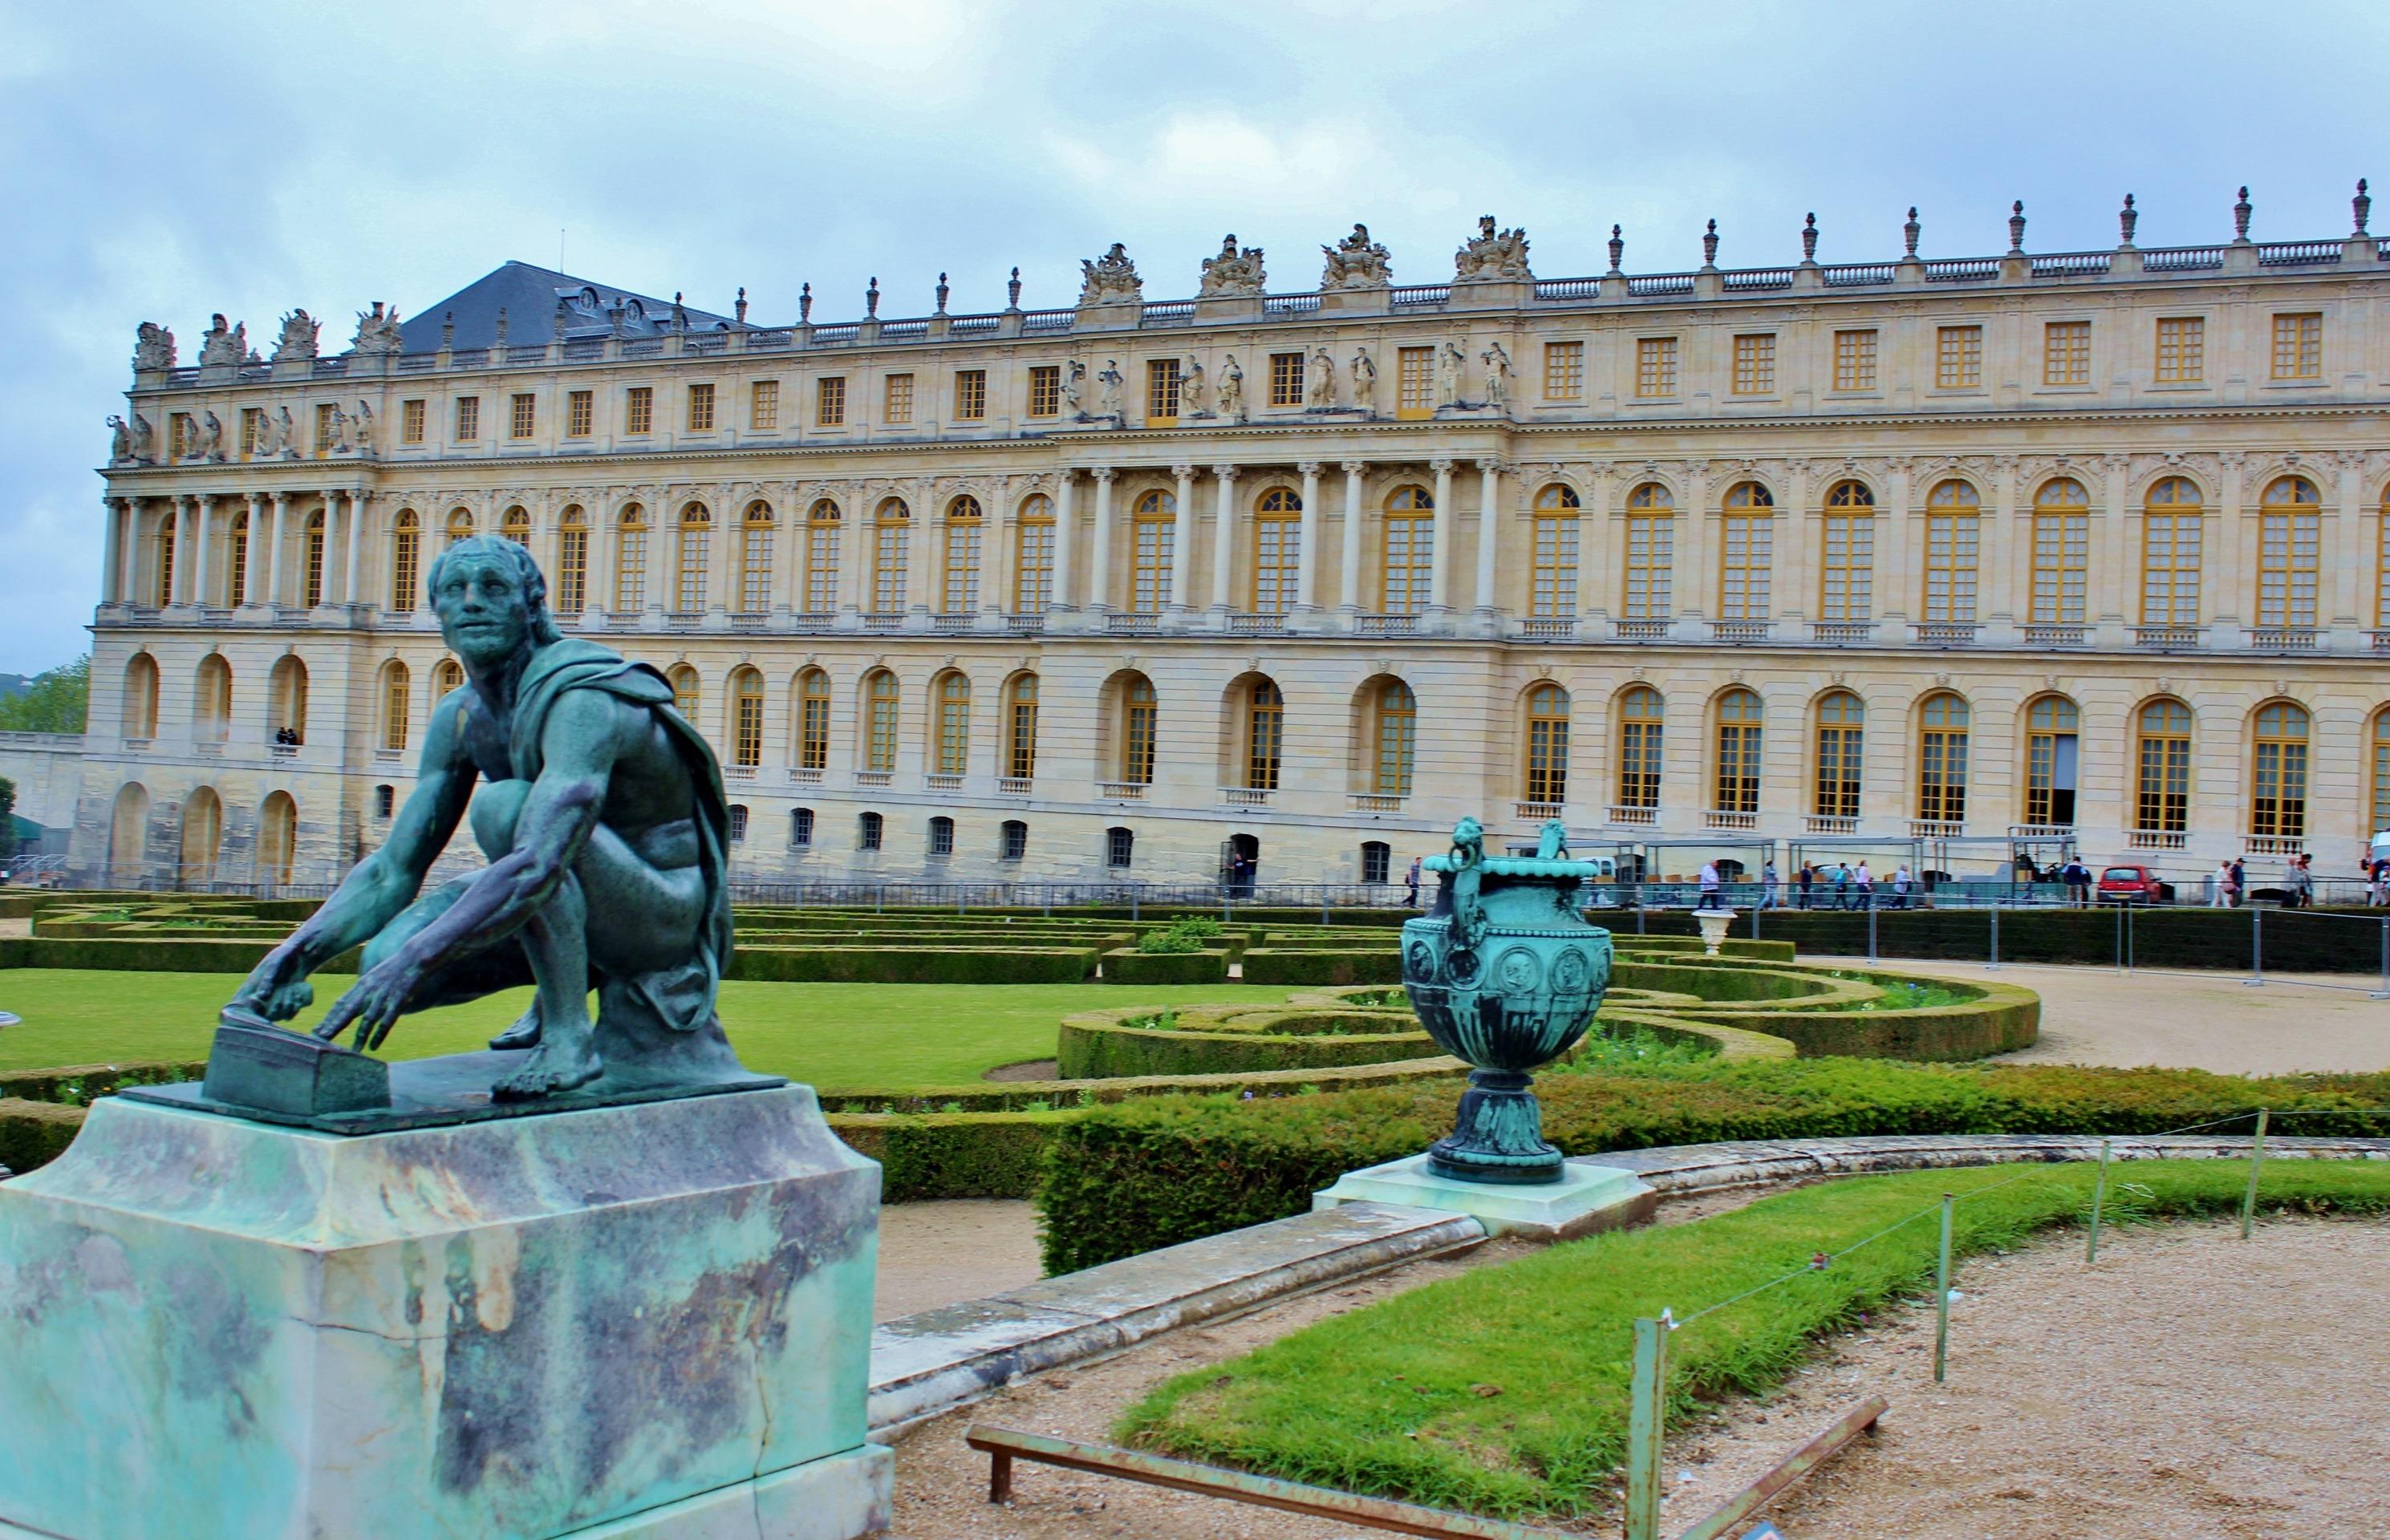 arkitektur bygning chateau slott paris monument Frankrike statue plaza landemerke historisk turisme historie torget berømt historisk